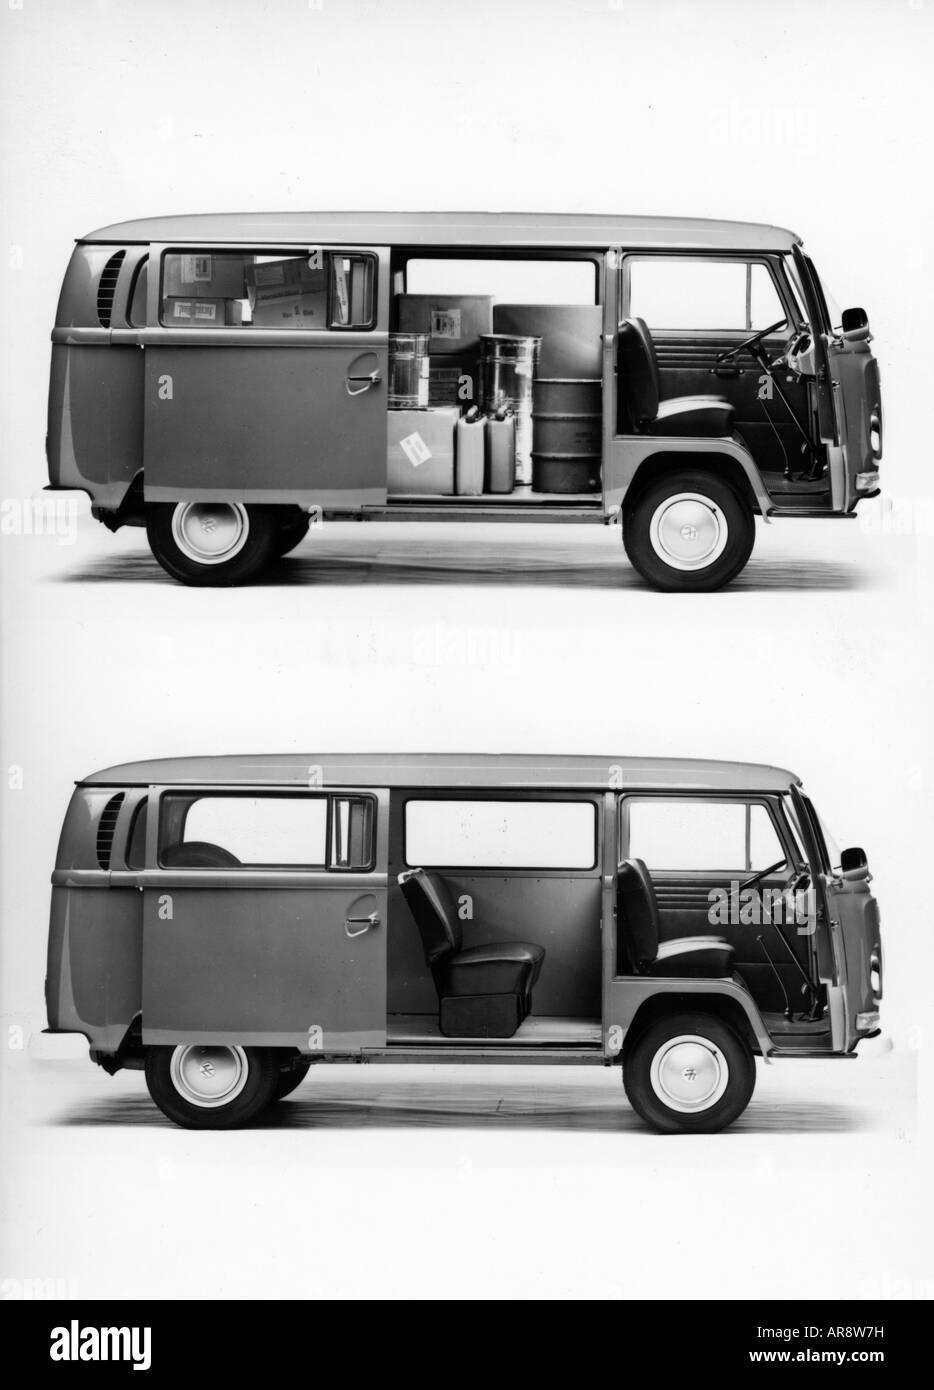 transport / transportation, car, vehicle variants, Volkswagen, VW Type 2, Transporter T2, side view, historic, historical, - Stock Image